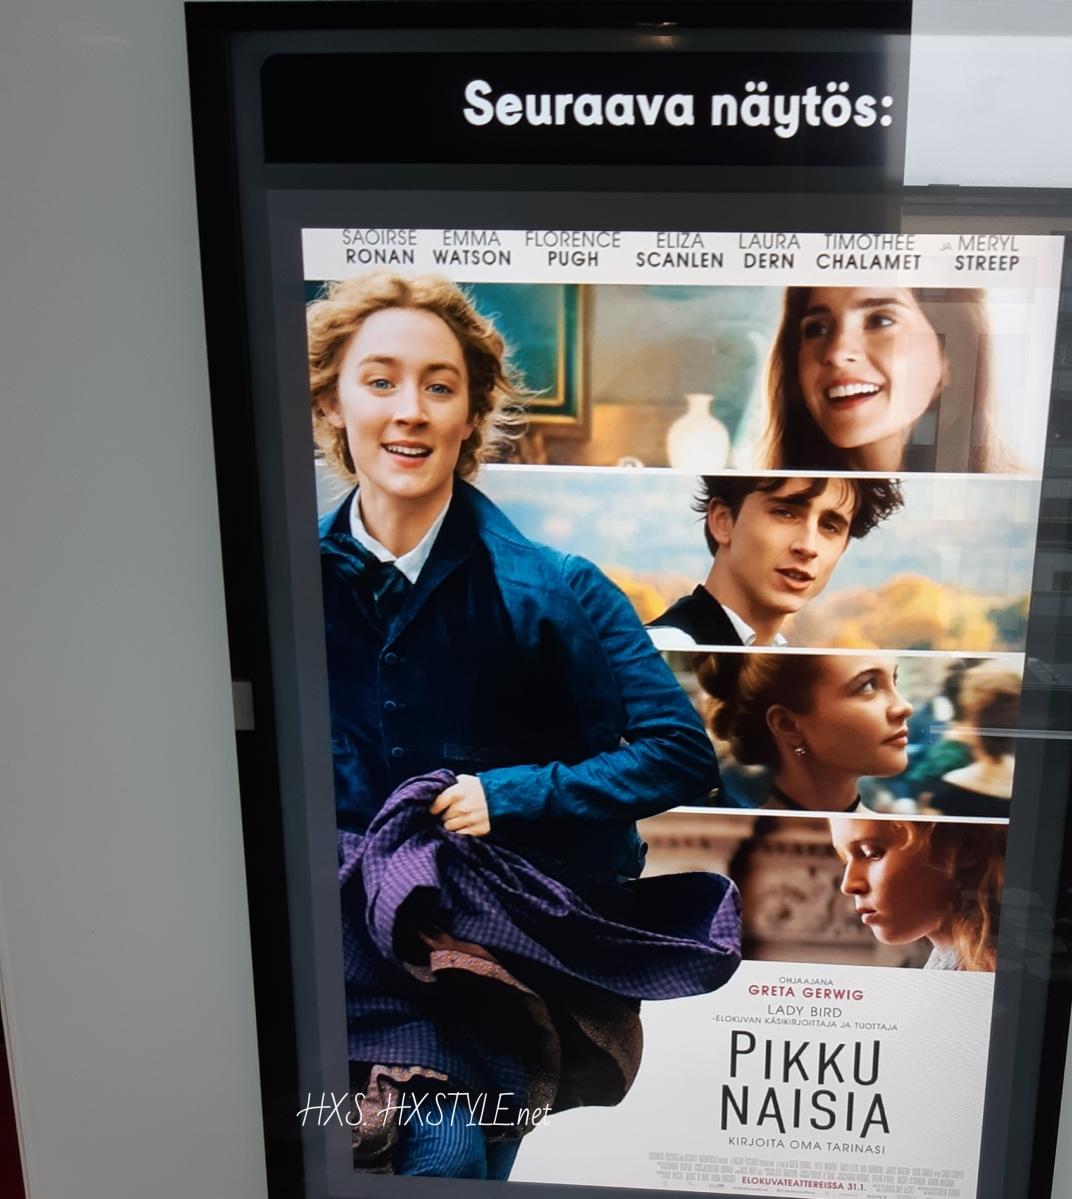 Uutuus Elokuvat